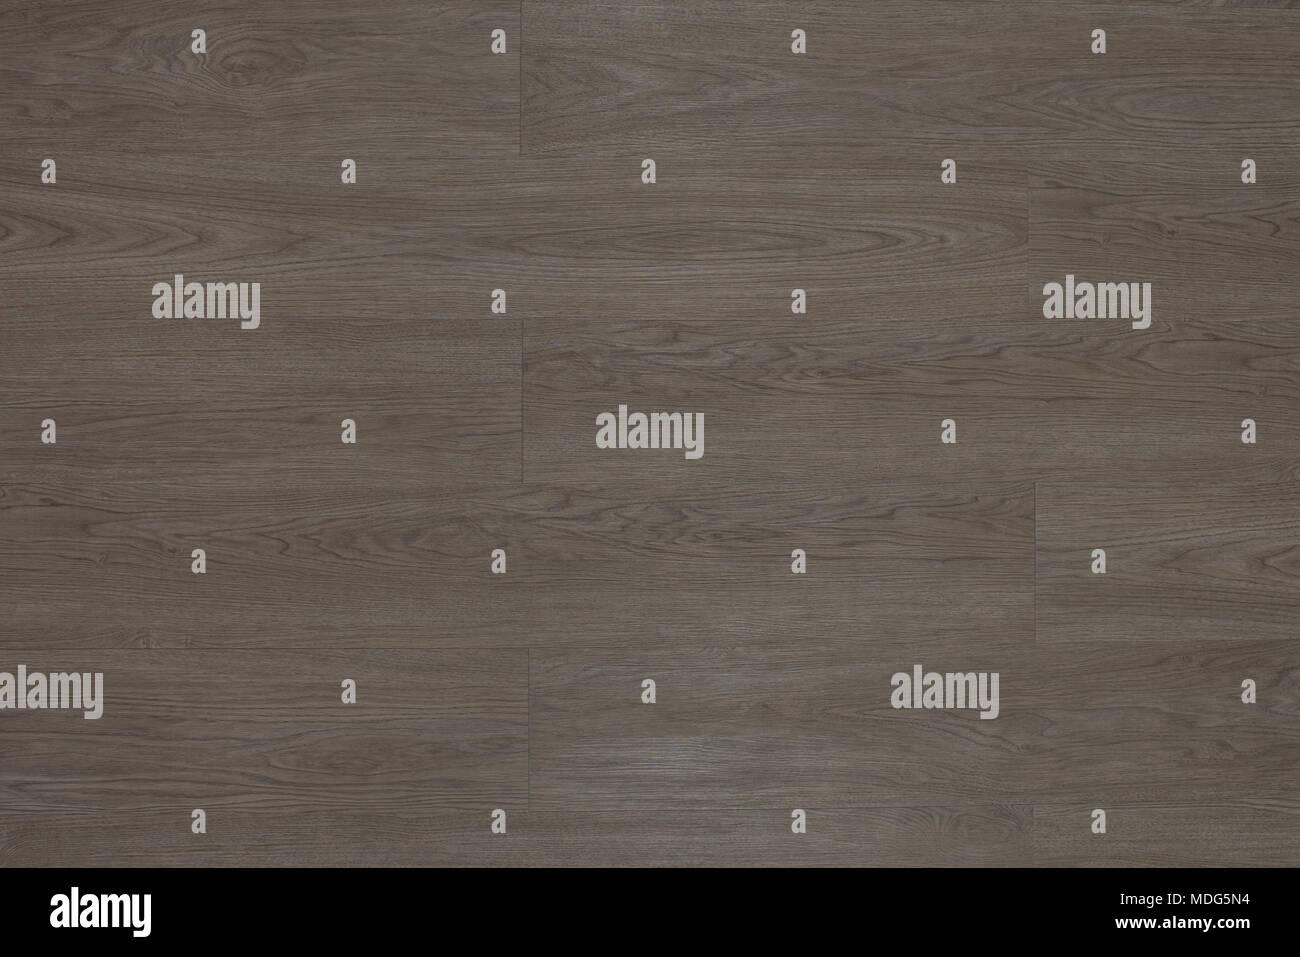 Wooden Oak flooring Planks - Stock Image